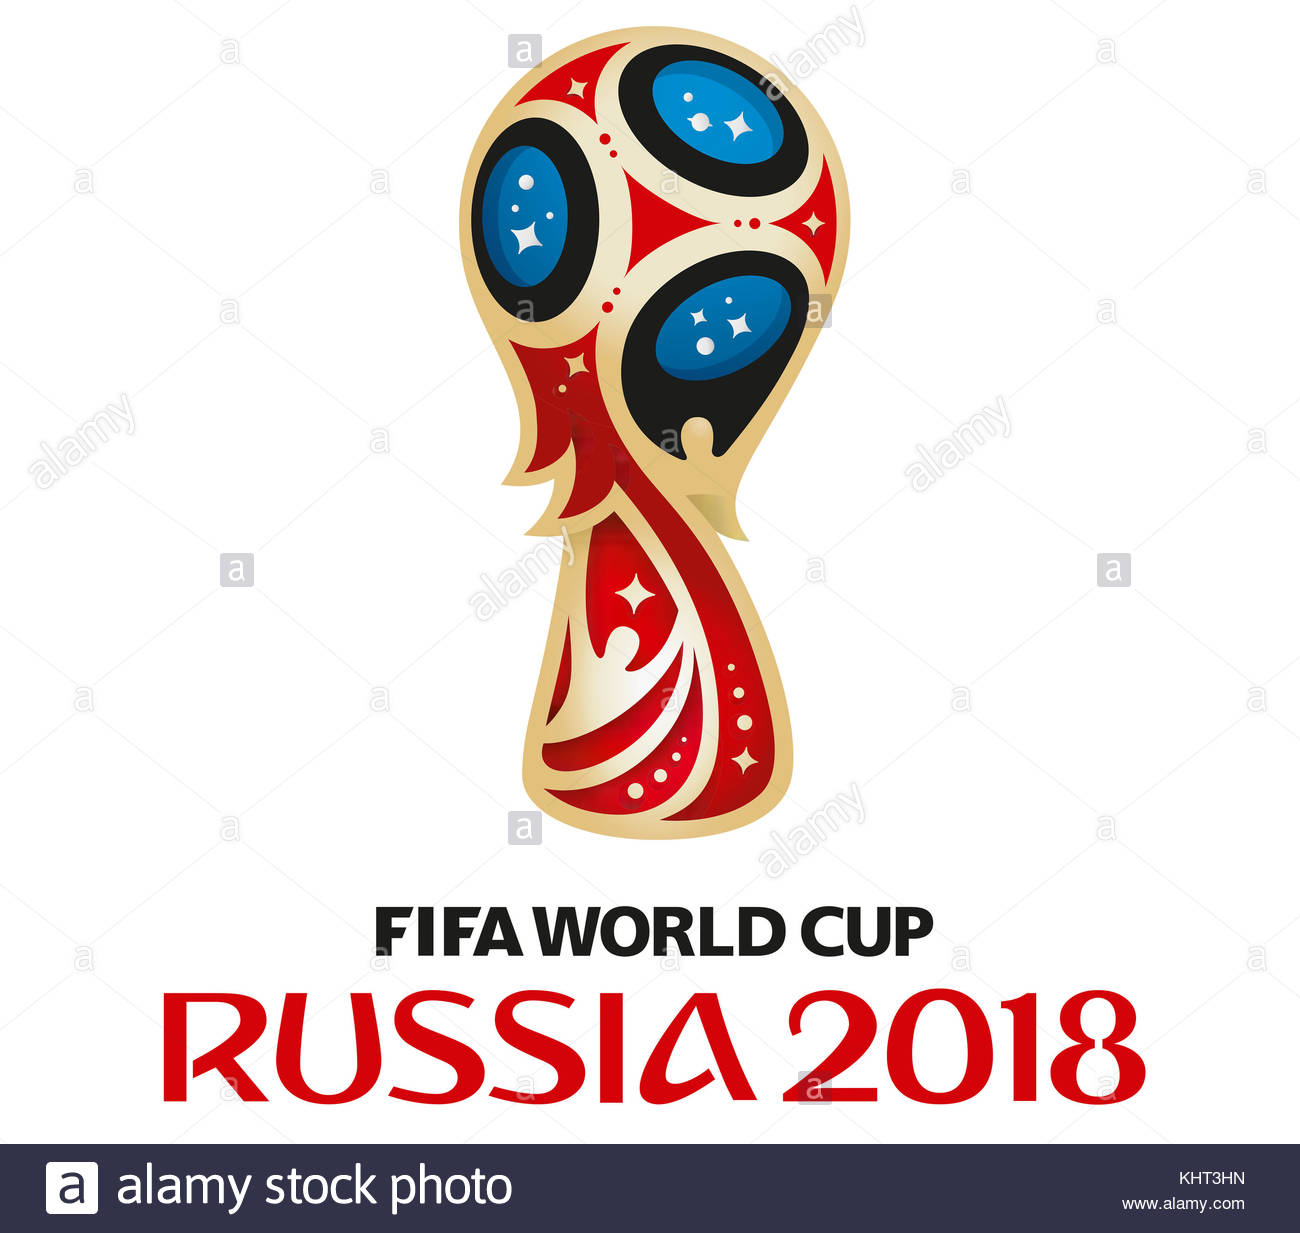 FIFA World Cup 2018 Russia icon logo - Stock Image